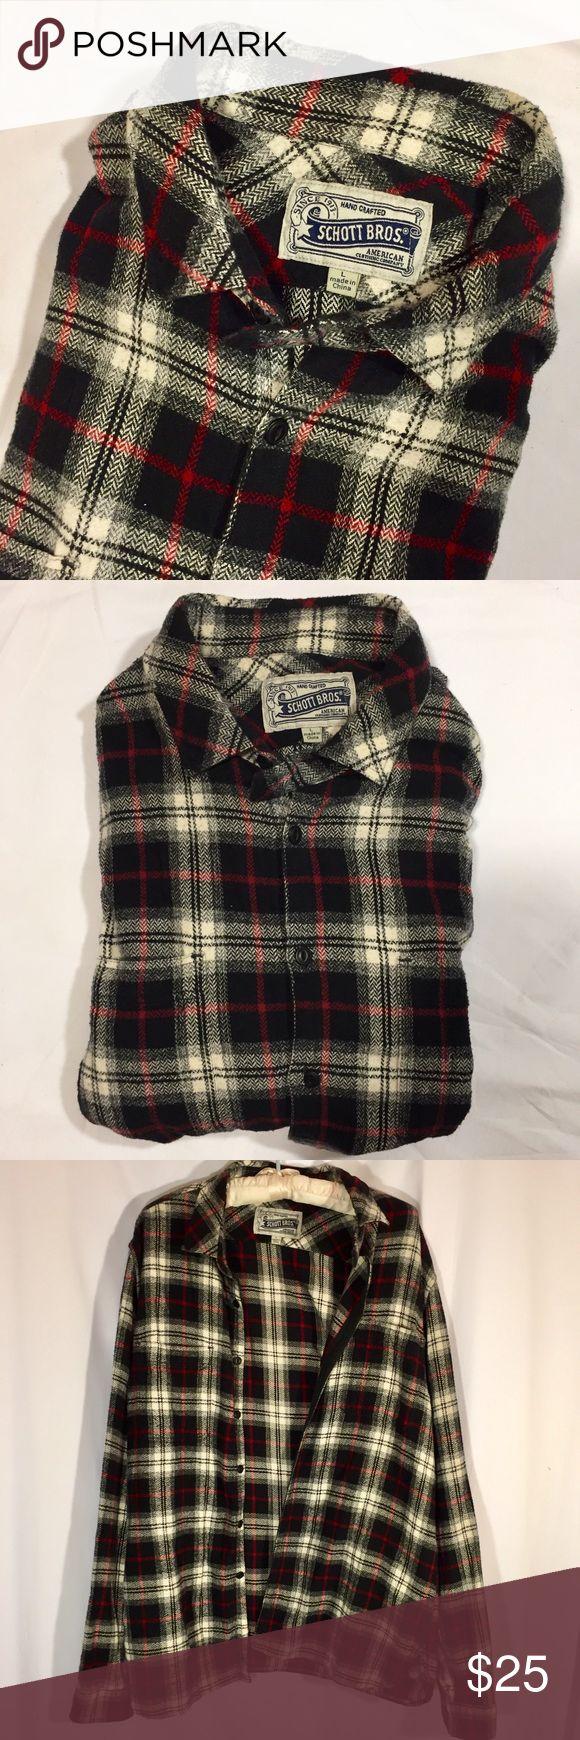 Shirt design near me - Schott Brothers Flannel Red Black Plaid Shirt